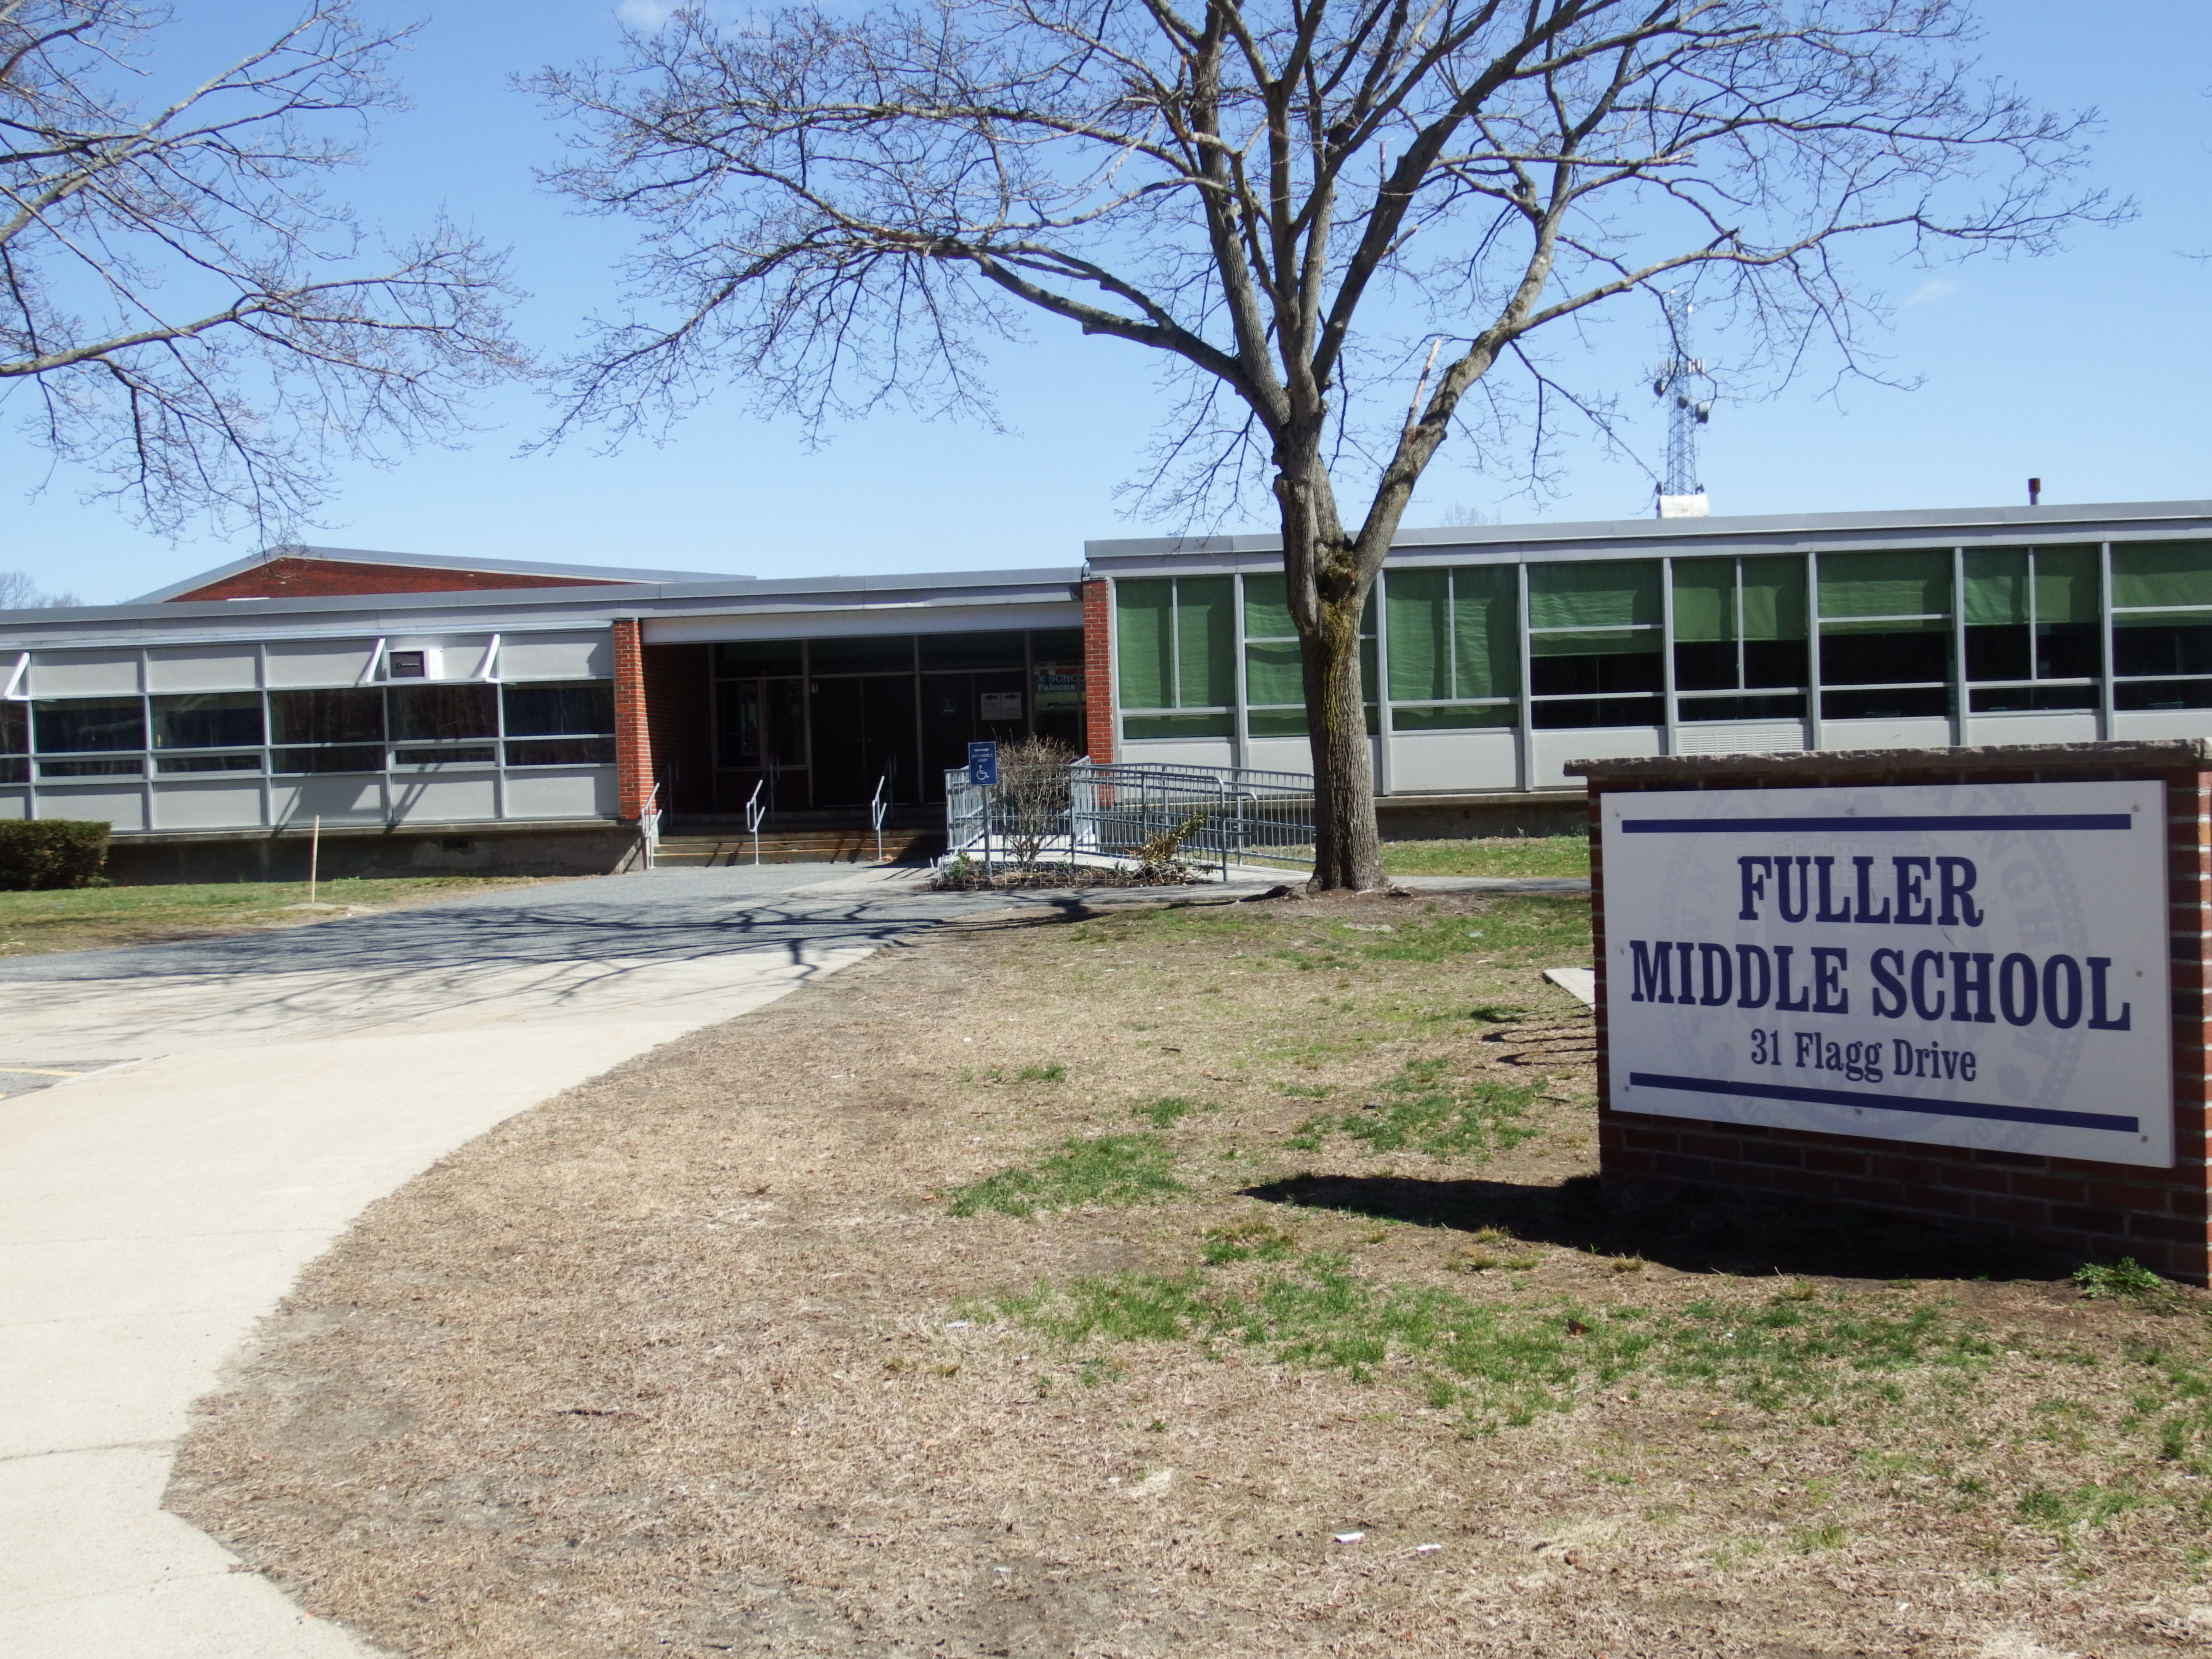 Fuller Middle School logo